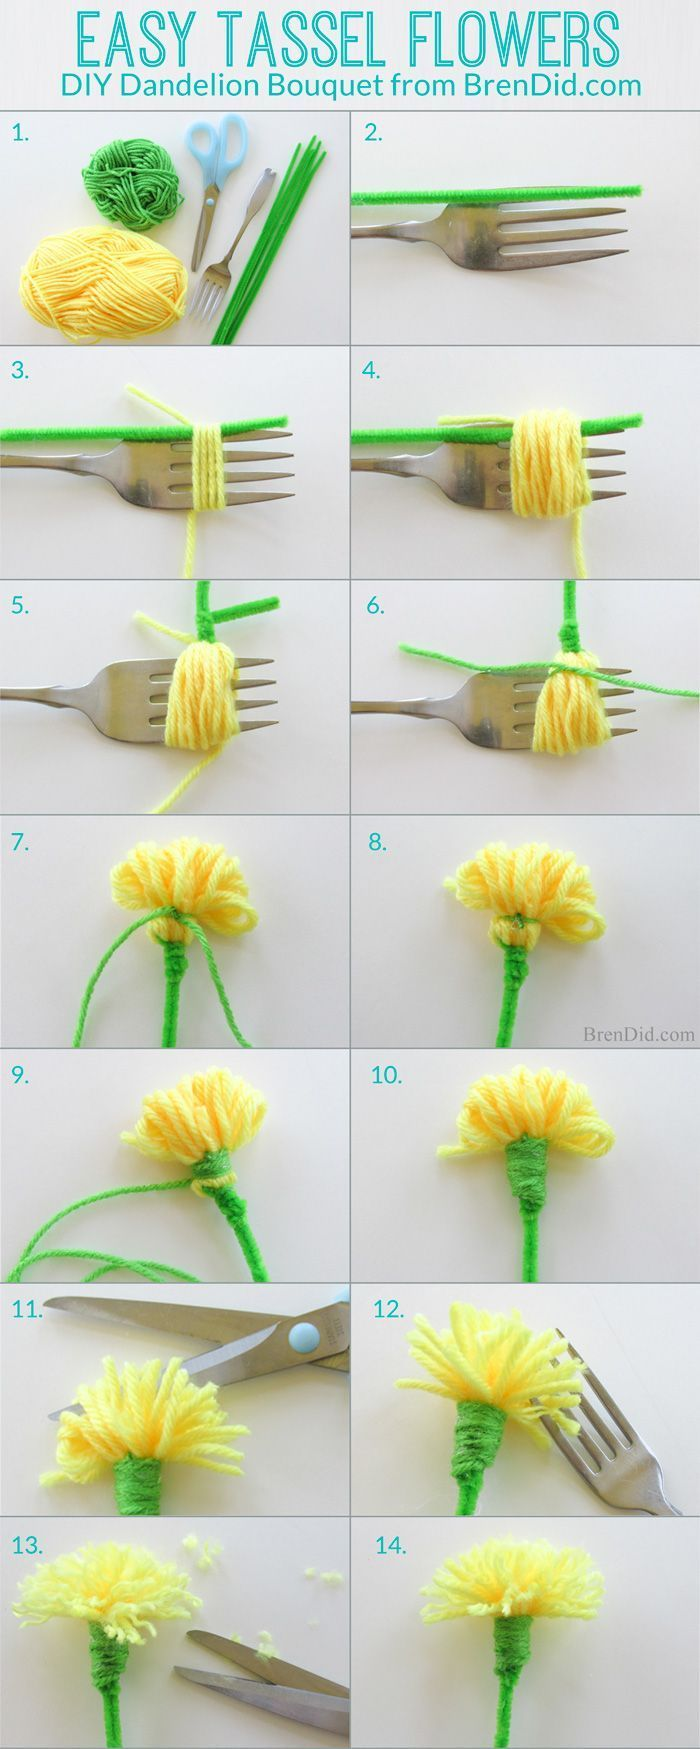 Diy manualidad flor de lana crafty ideas for adults - Manualidades en lana ...